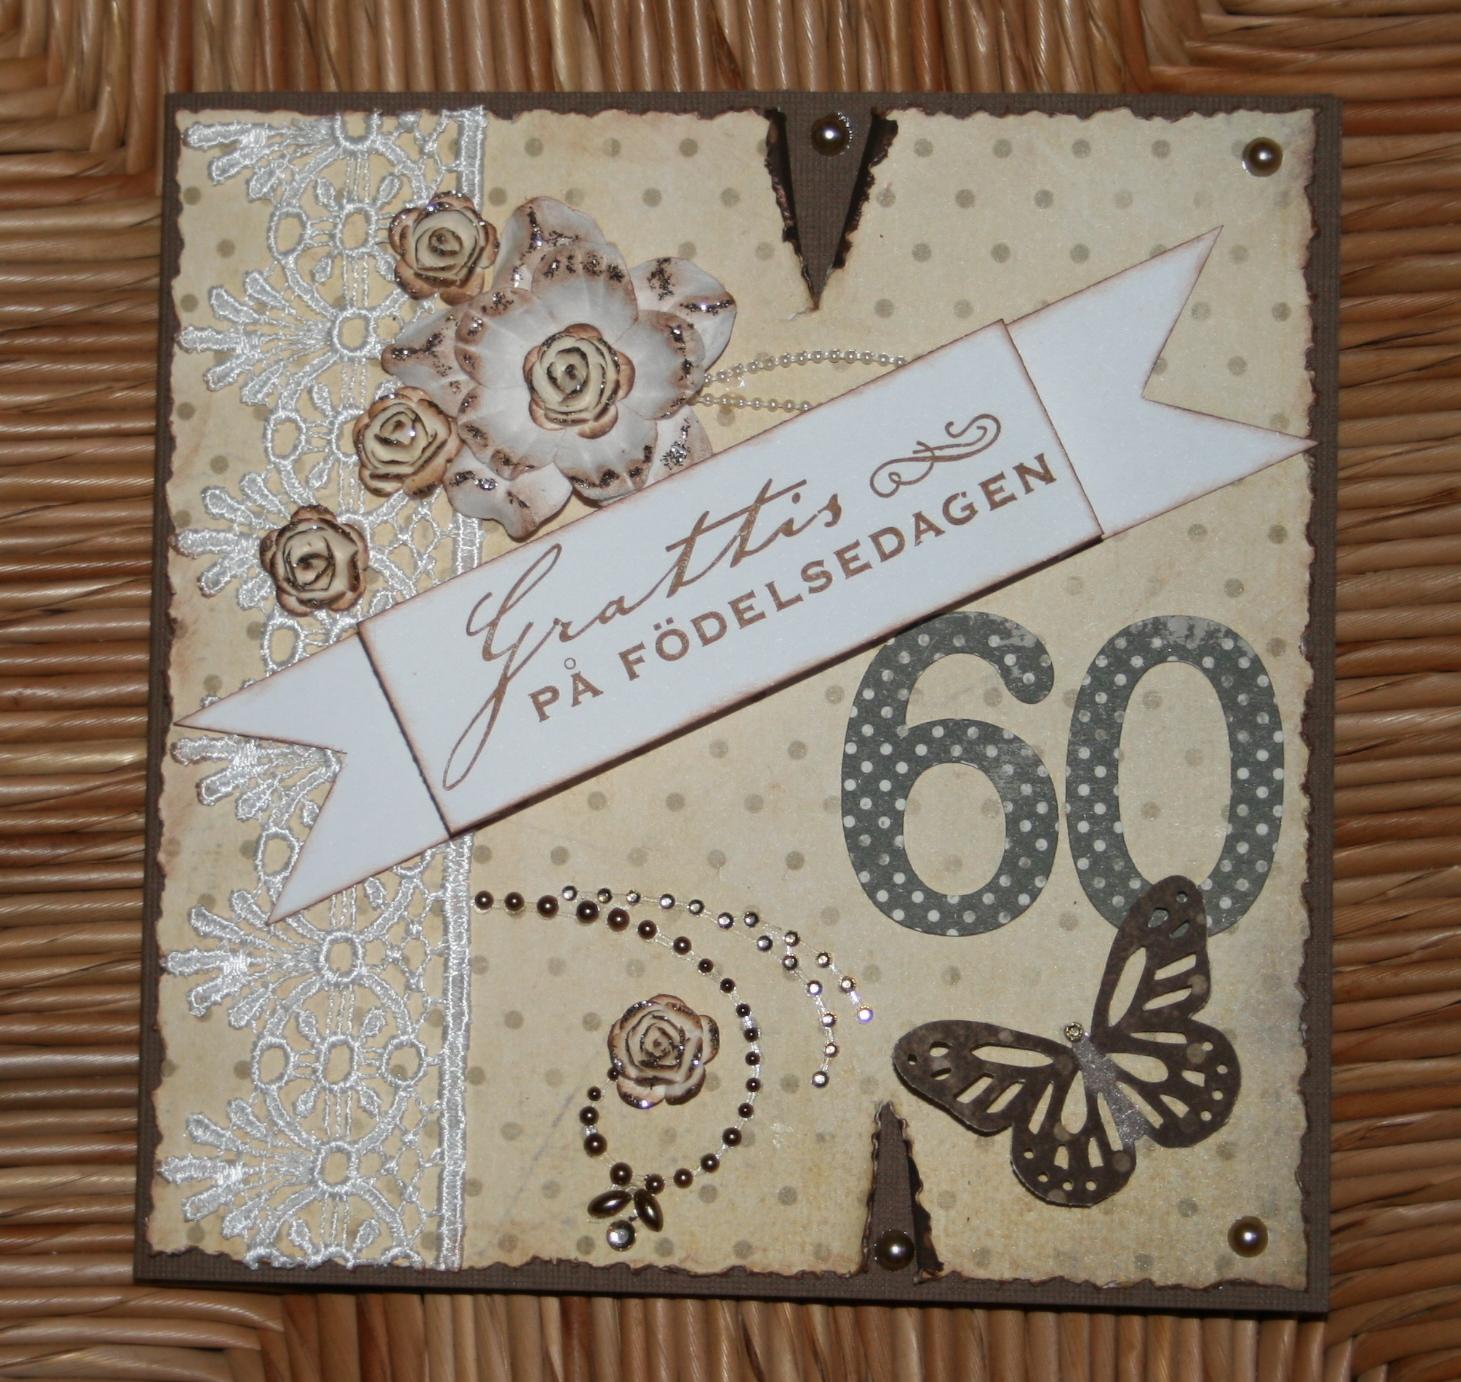 60 års kort Pysselmadame: Ett 60års kort. 60 års kort